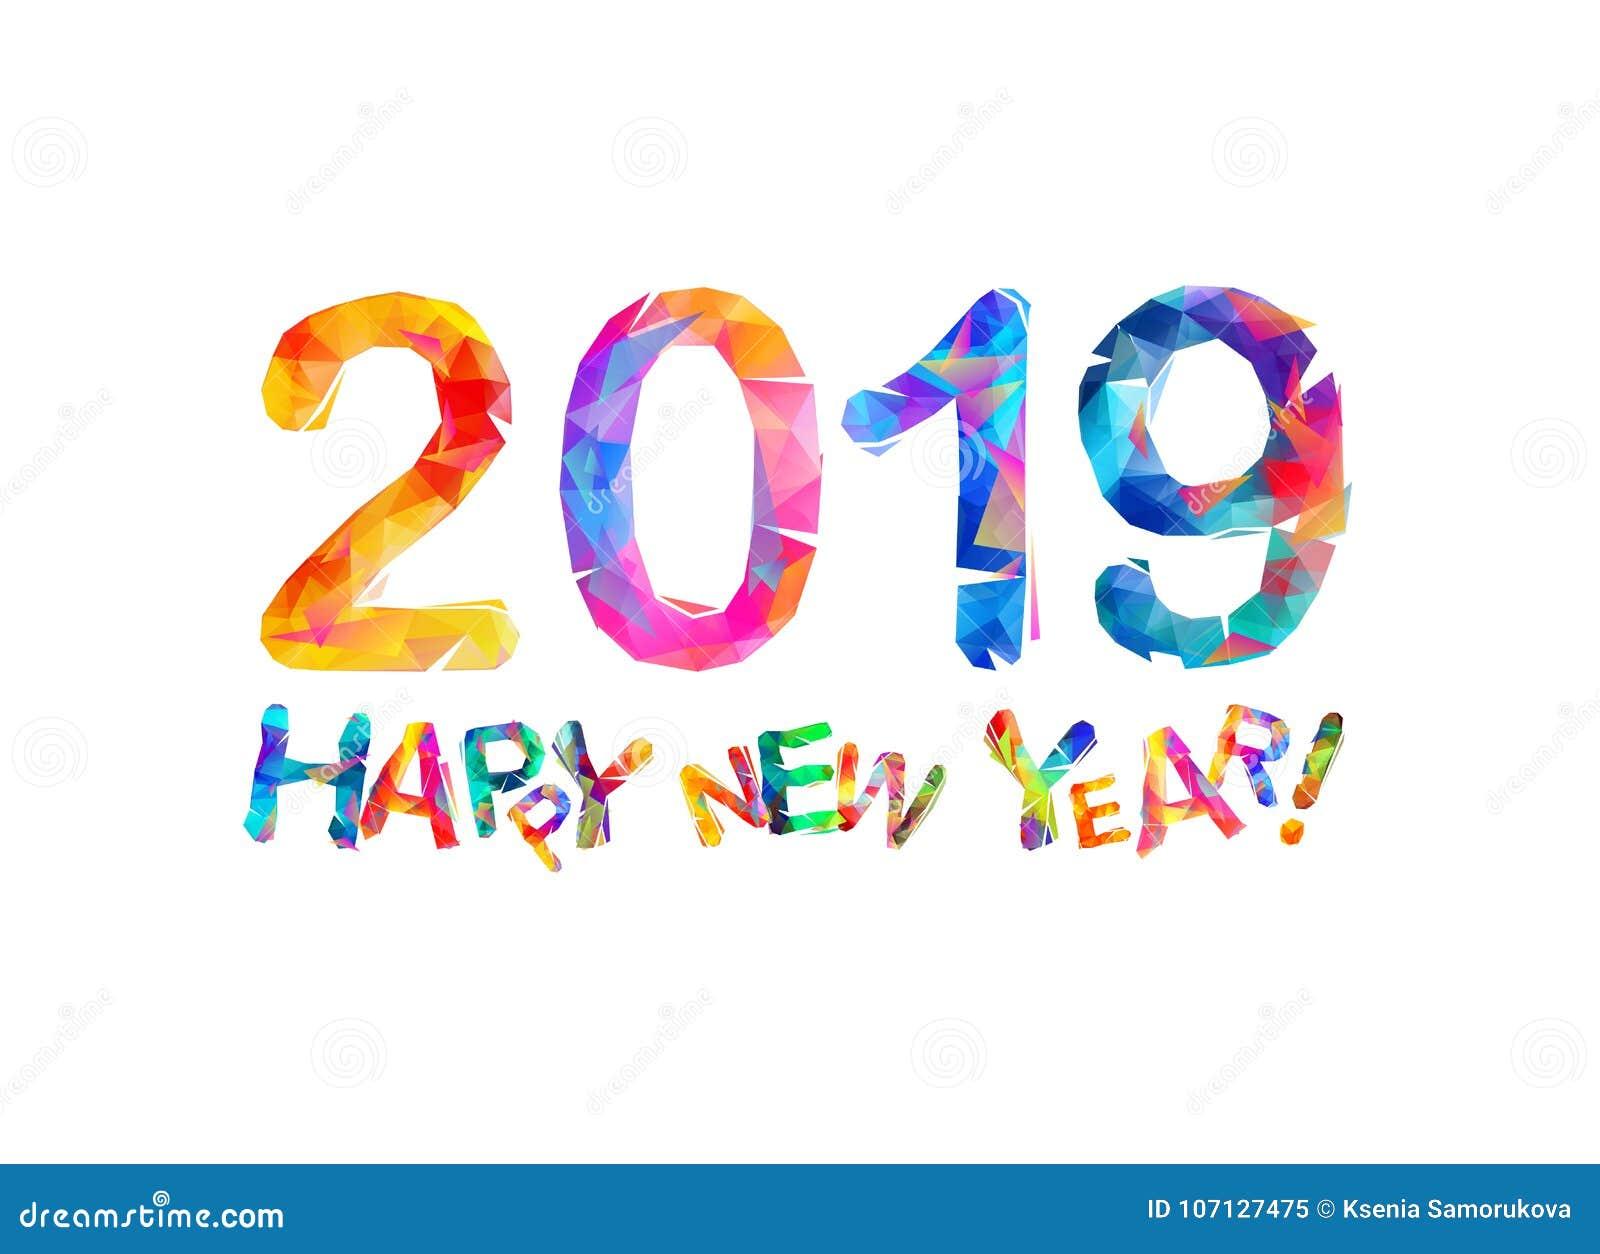 happy new year 2019 congratulation card